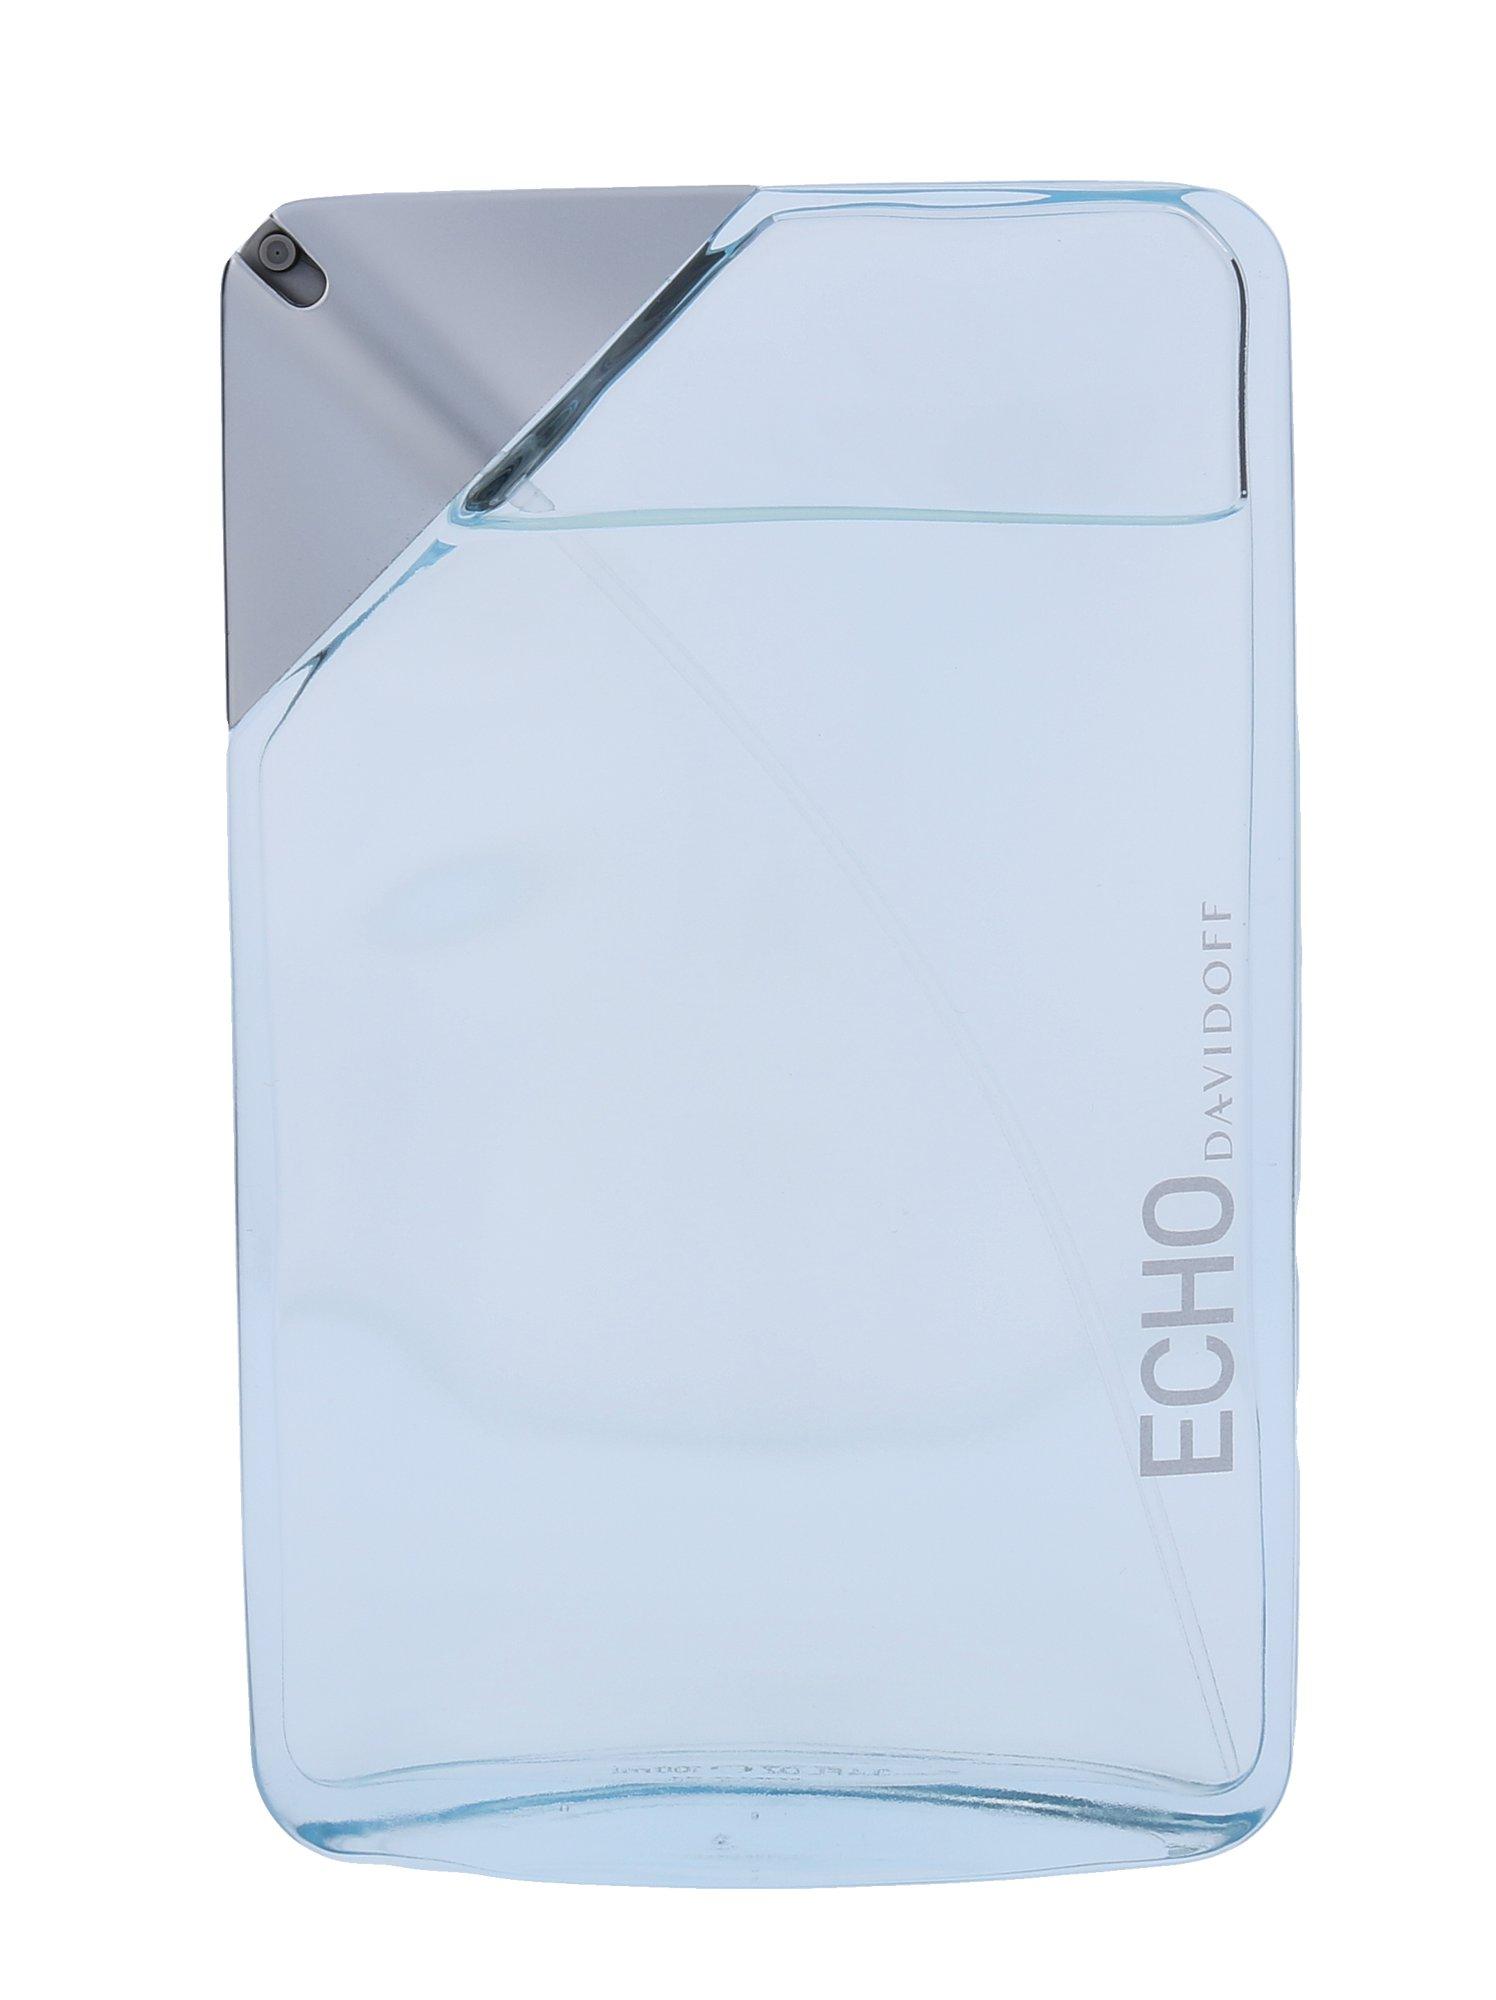 Davidoff Echo for Man, Toaletní voda 100ml - Tester